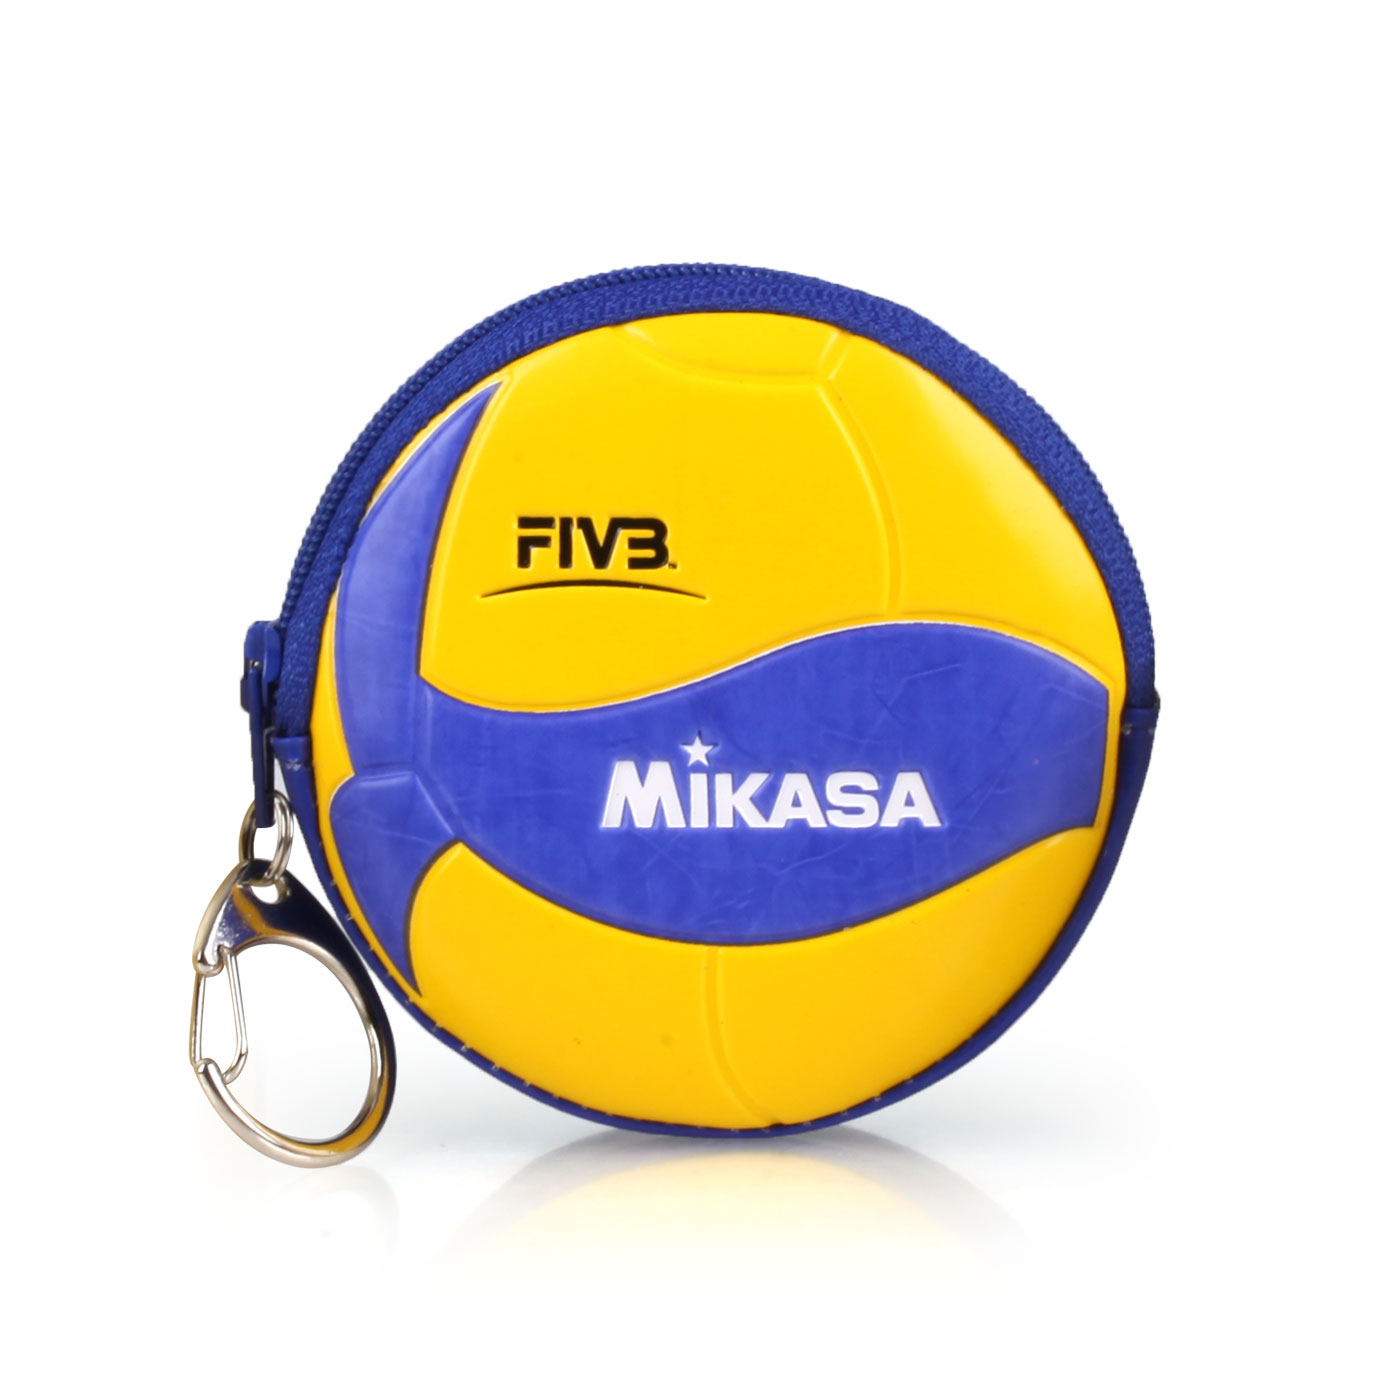 MIKASA 零錢包 MKAC-CP200W